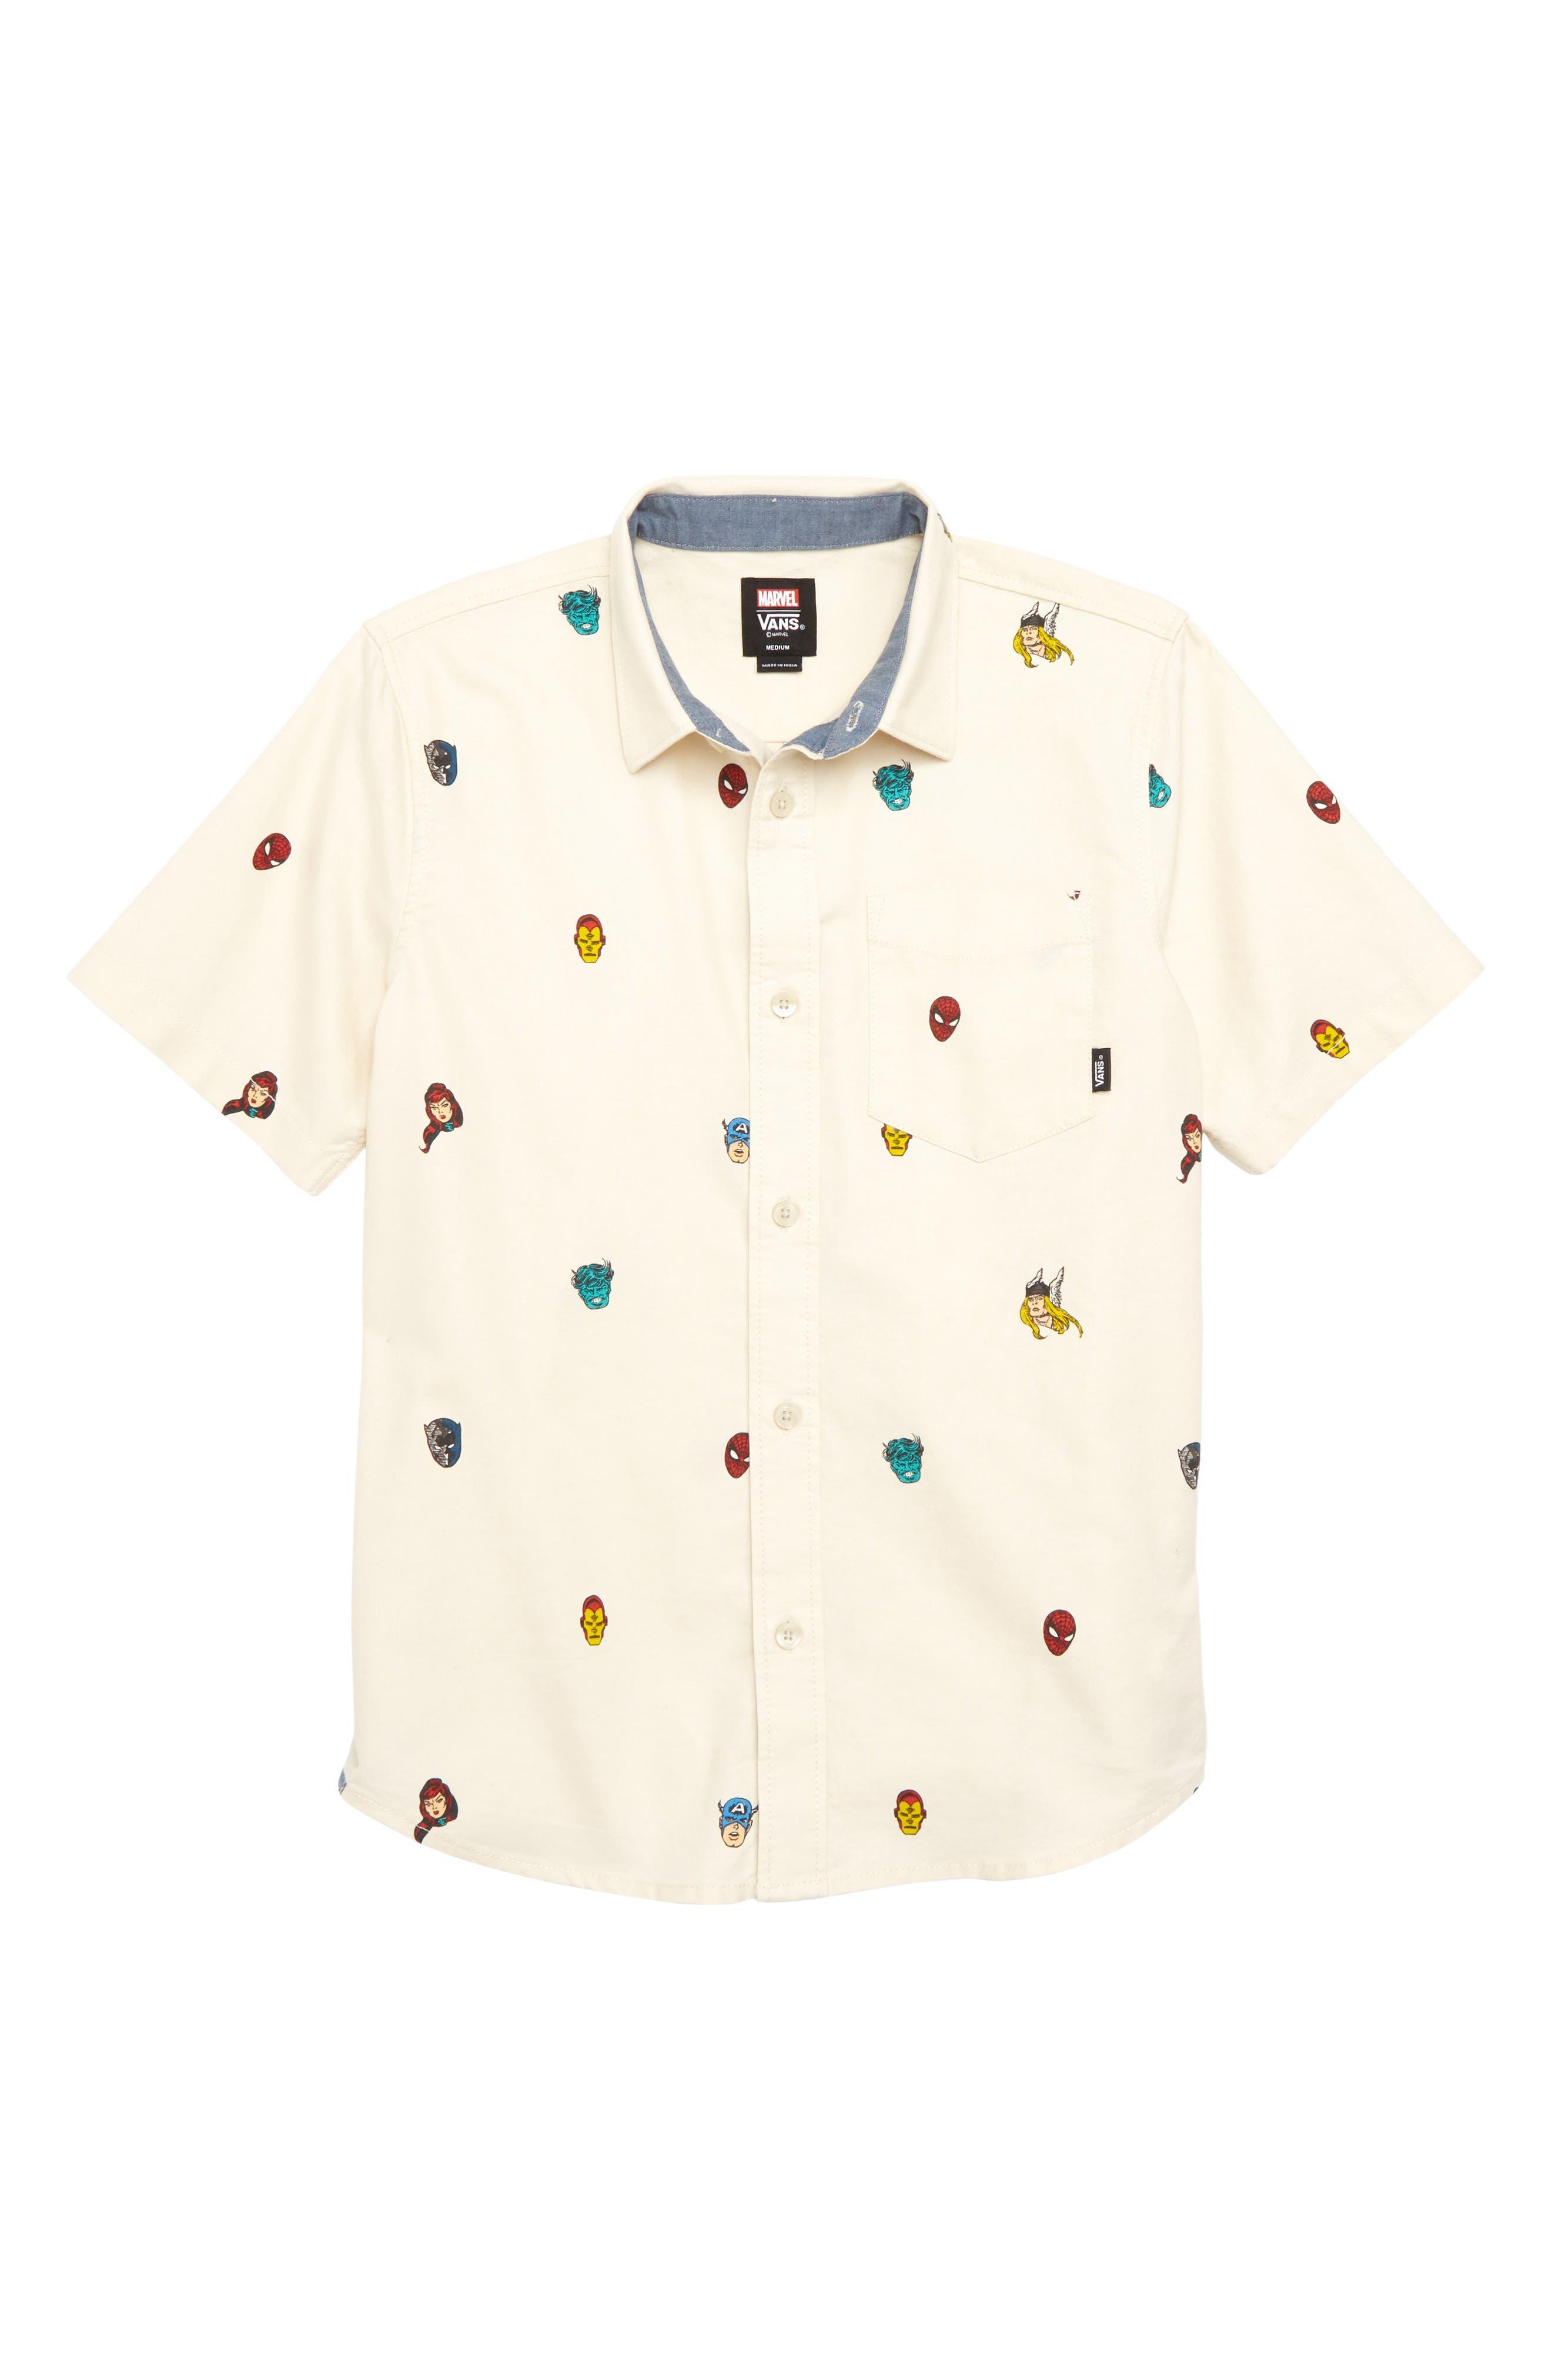 x Marvel<sup>®</sup> Avengers Woven Shirt,                         Main,                         color, Beige